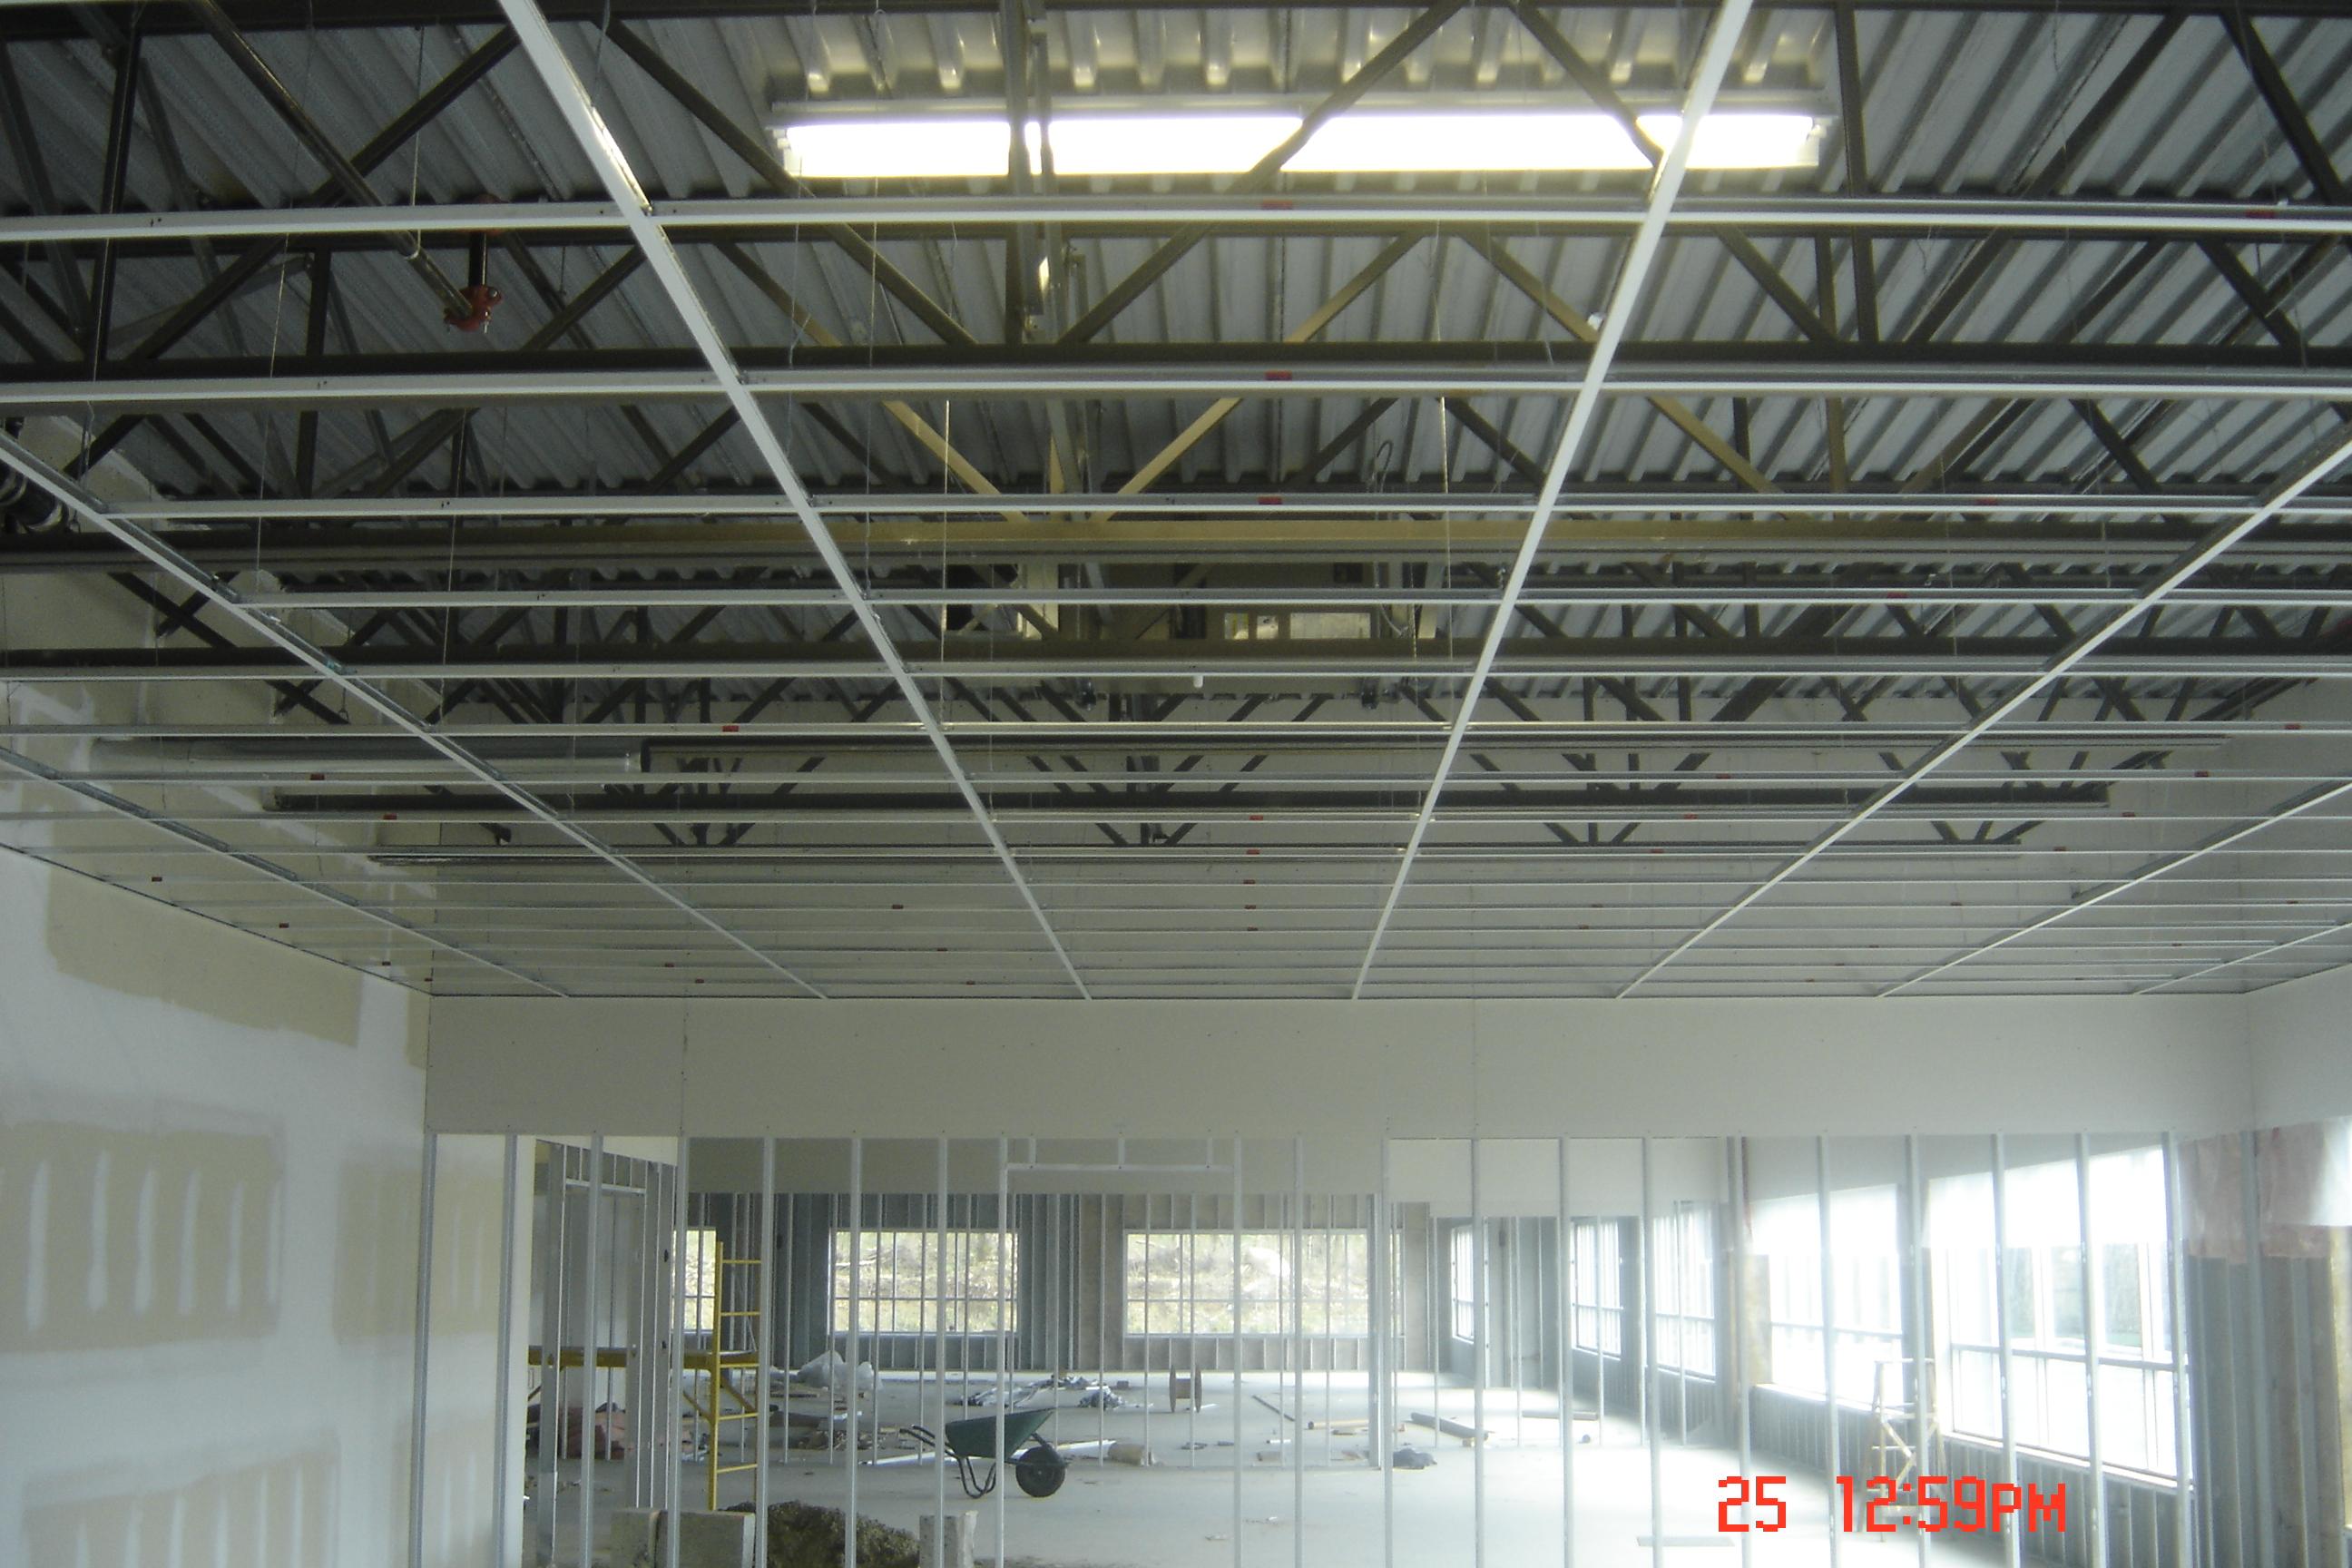 https://0901.nccdn.net/4_2/000/000/046/6ea/prado-buildings-10hwy-001.jpg